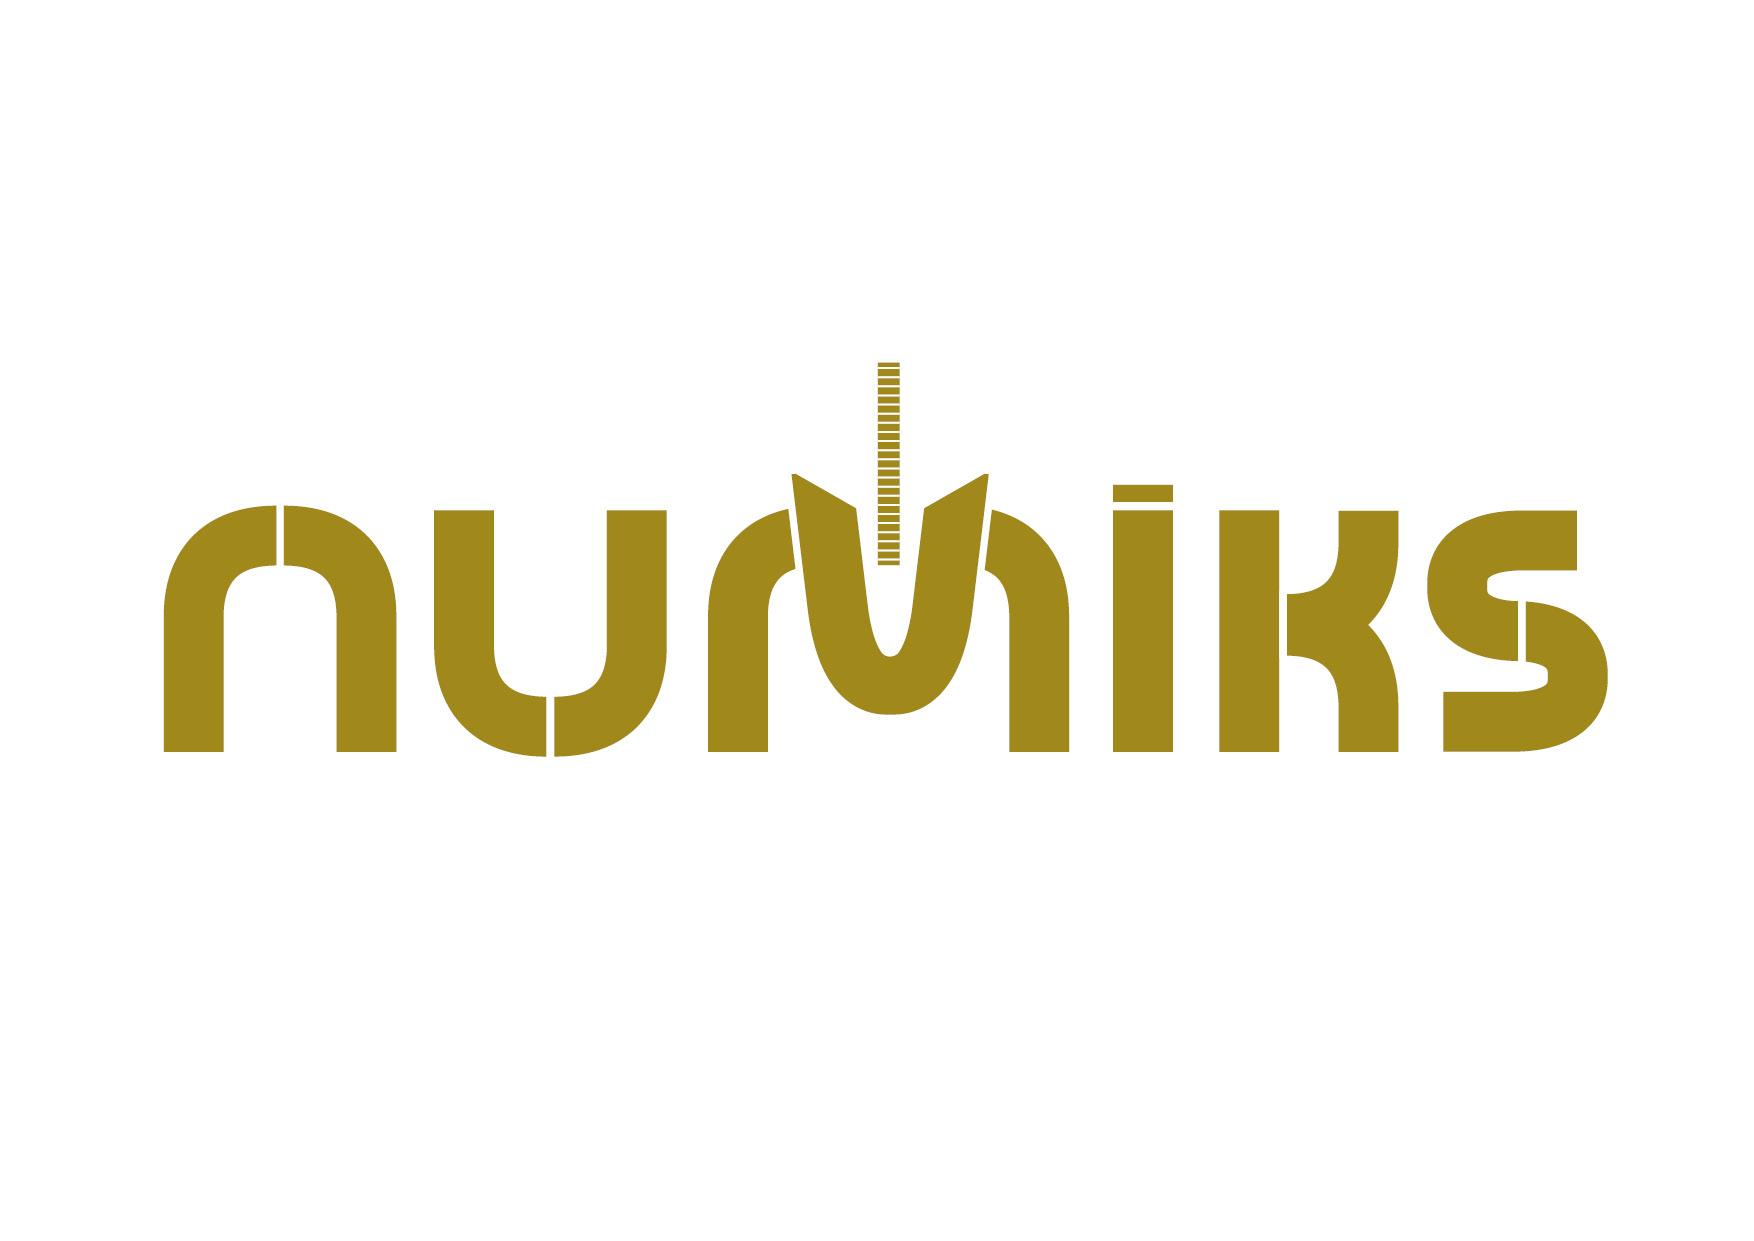 Логотип для интернет-магазина фото f_5765ec64459d460e.jpg